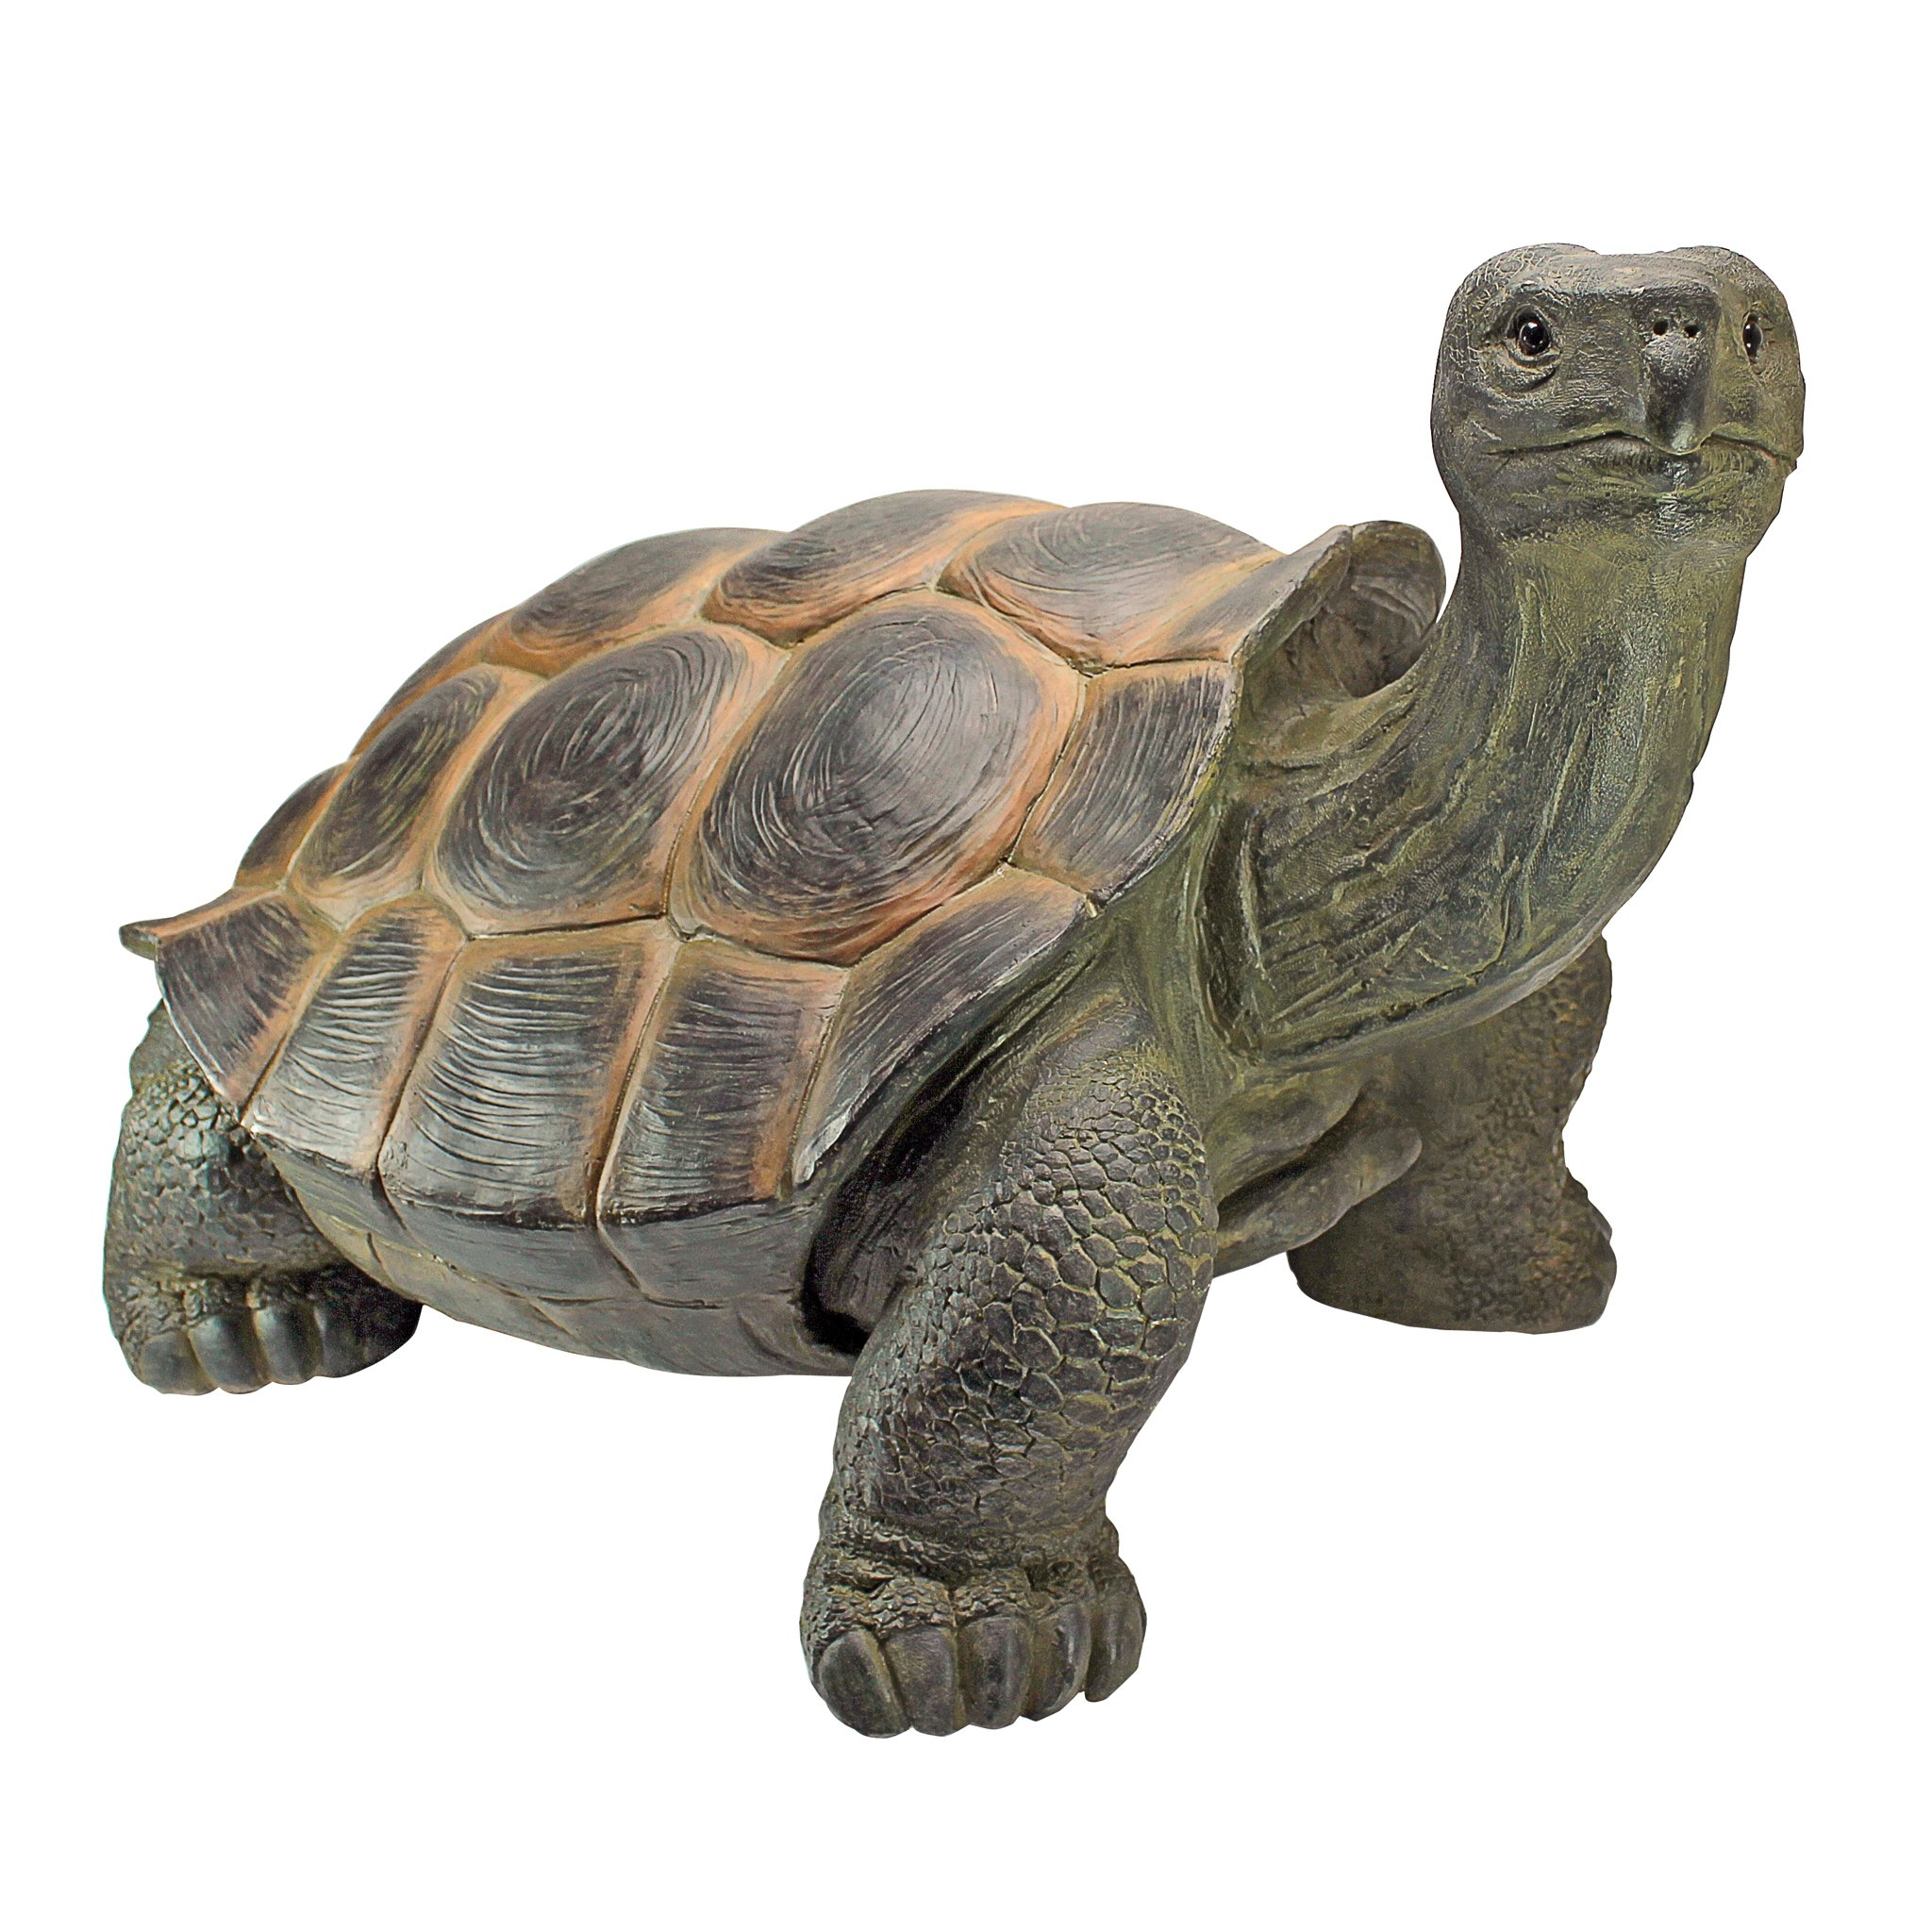 Design Toscano The Cagey Tortoise Statue